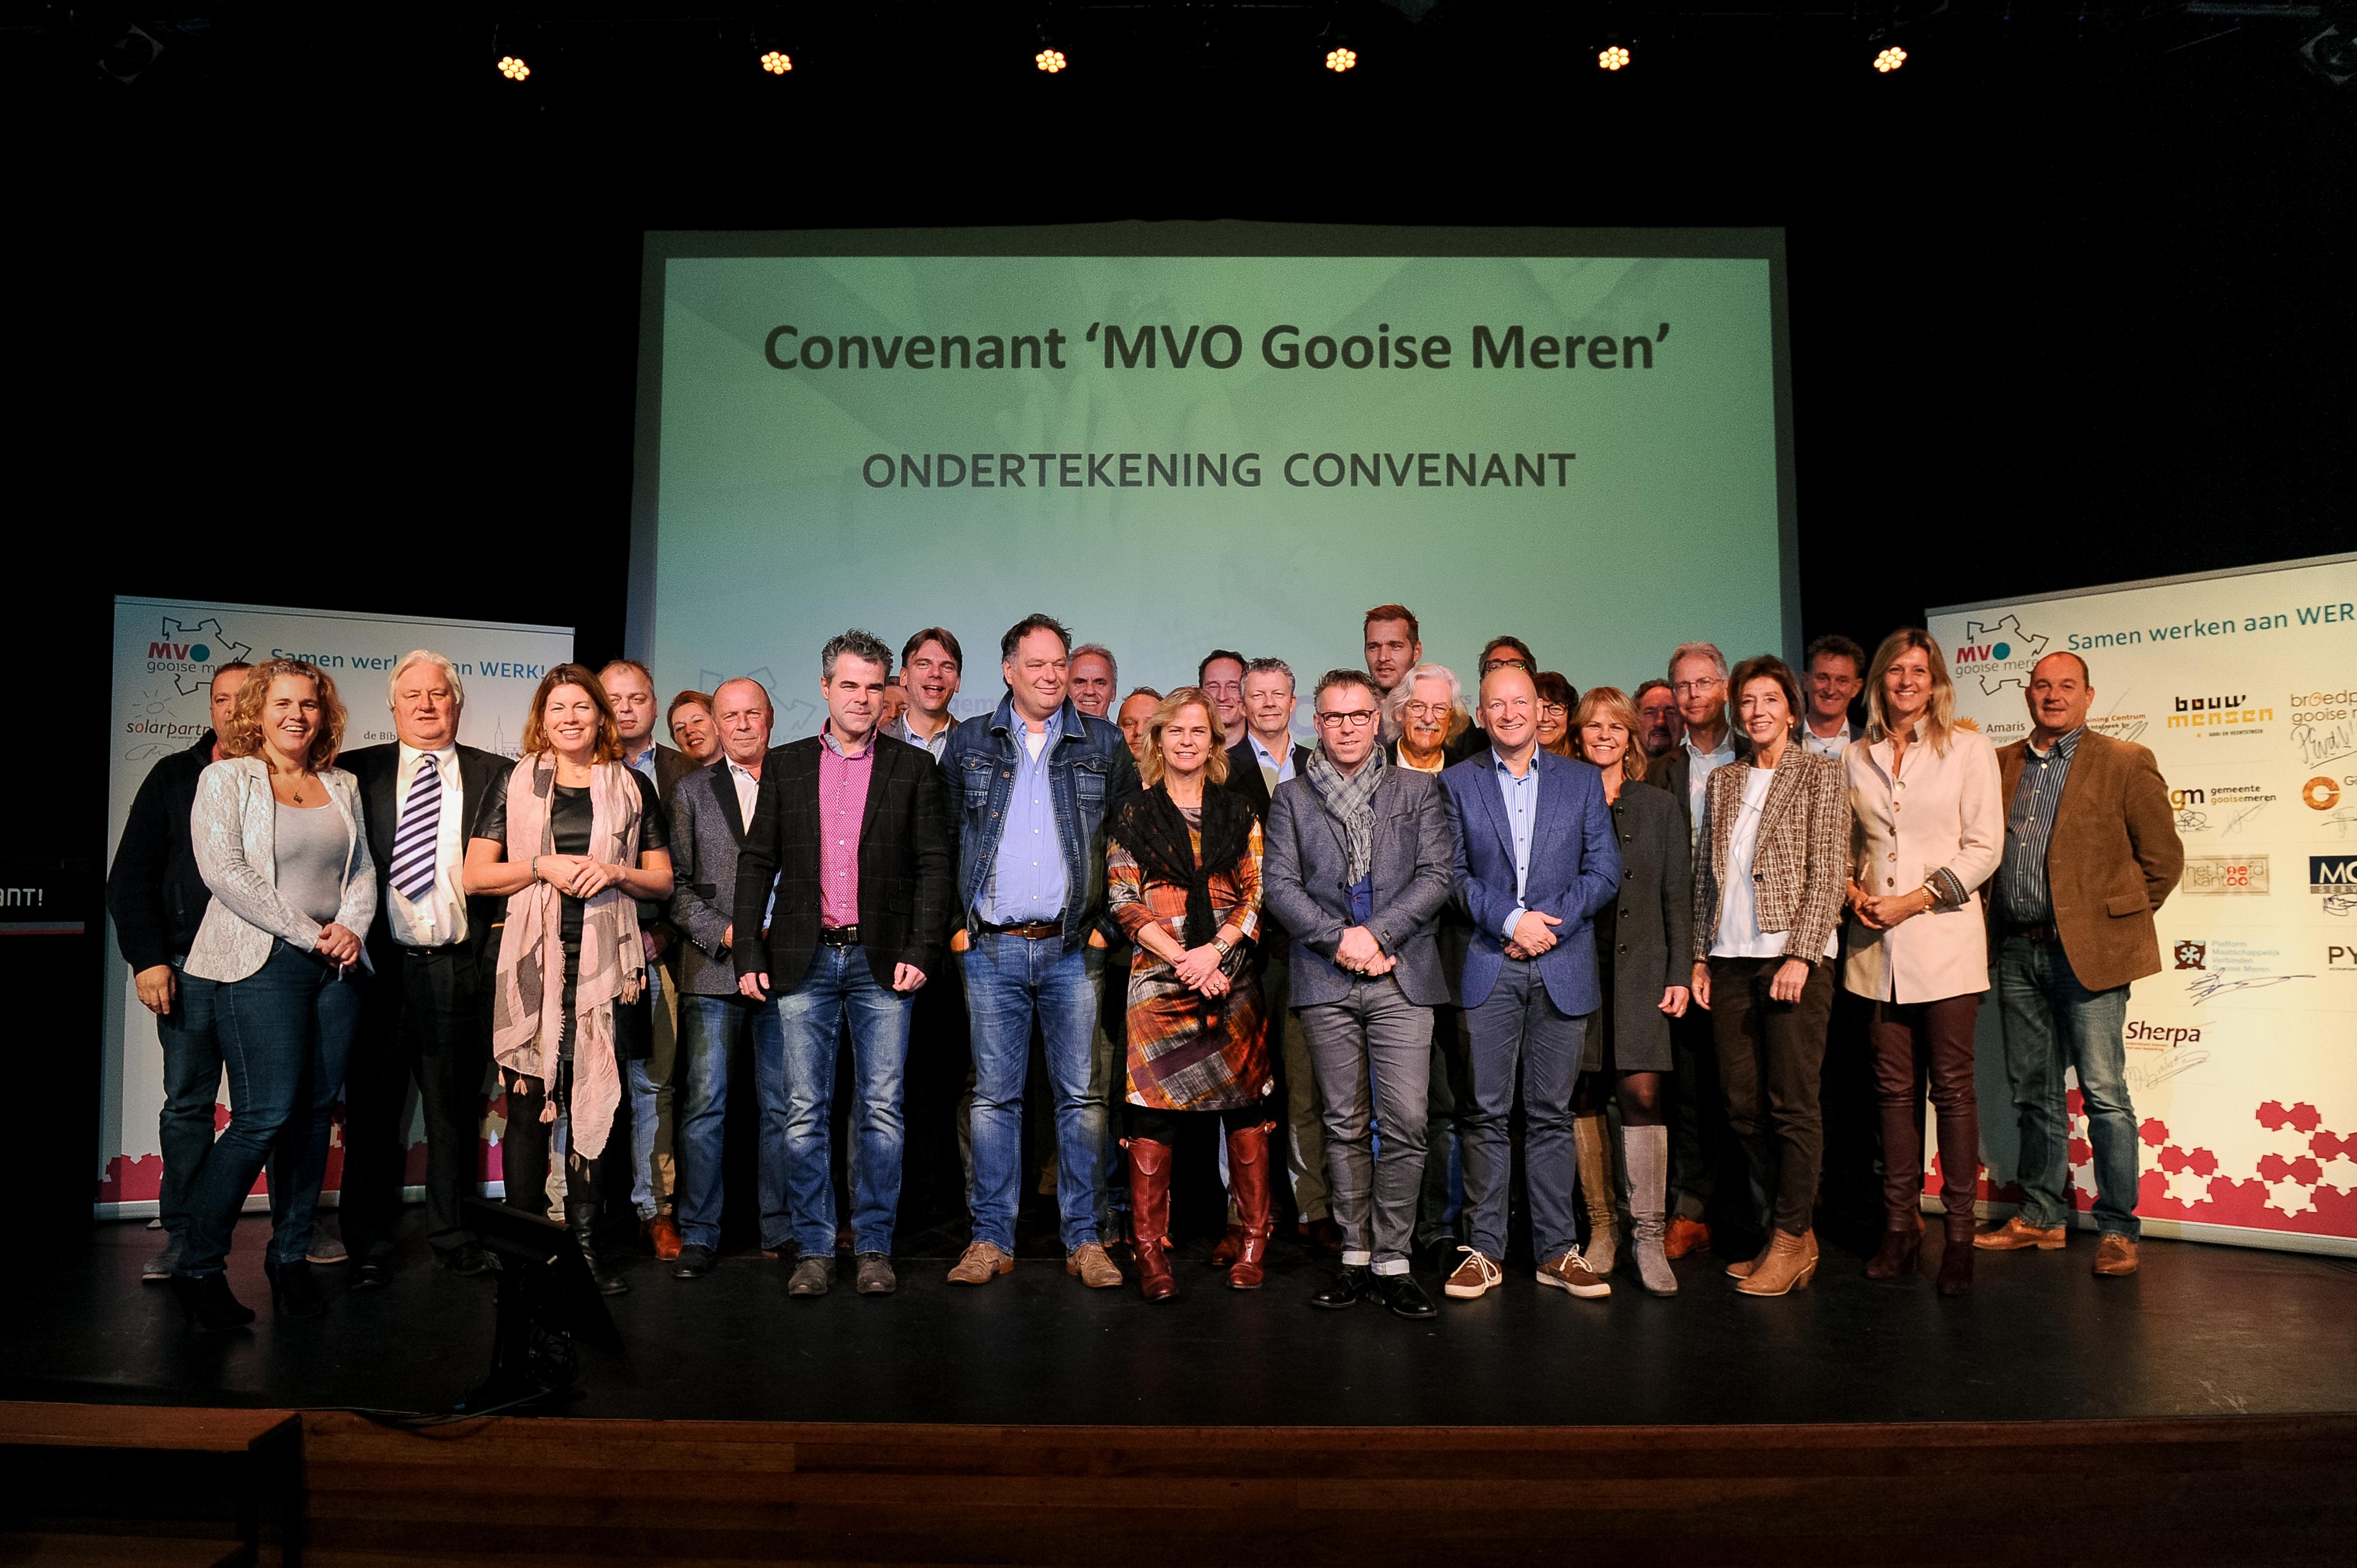 MVO, Gooise Meren, Convenant